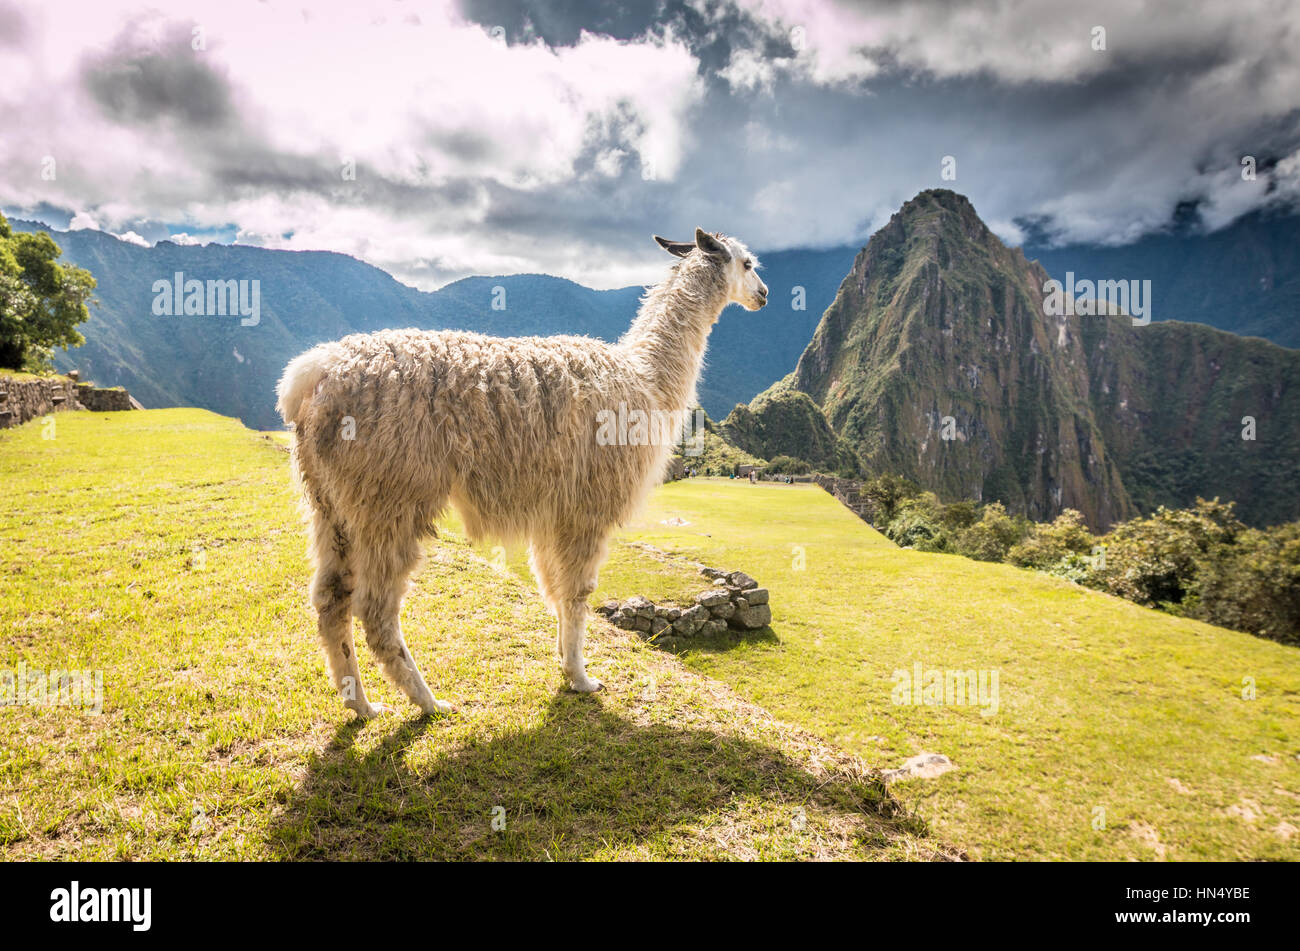 Llama in Machu Picchu - Stock Image